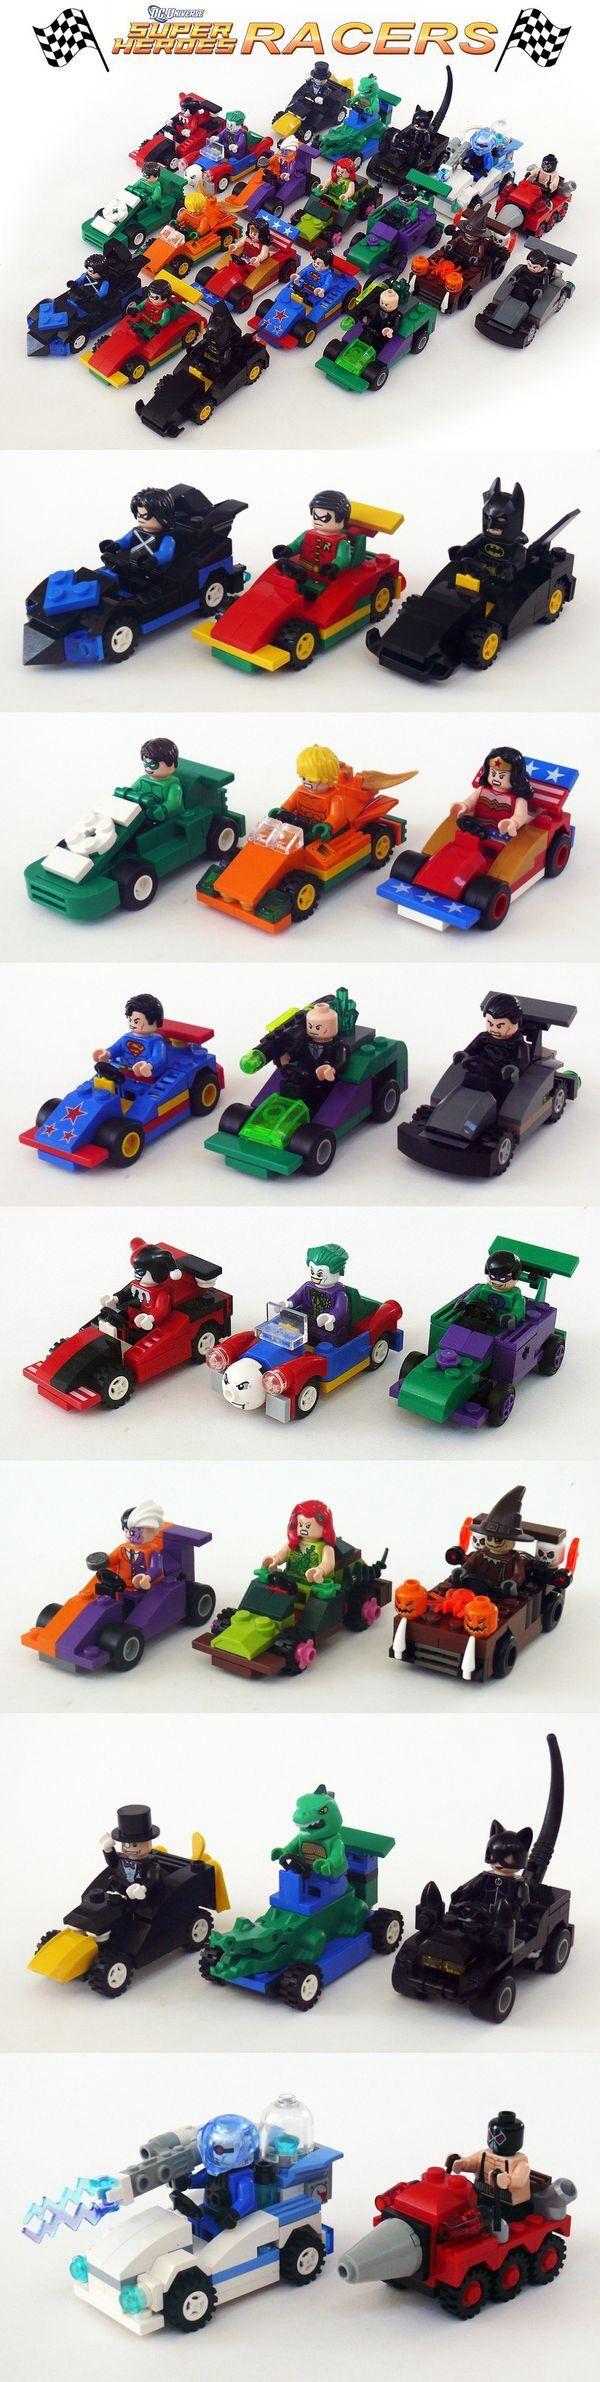 Lego super heroes cars